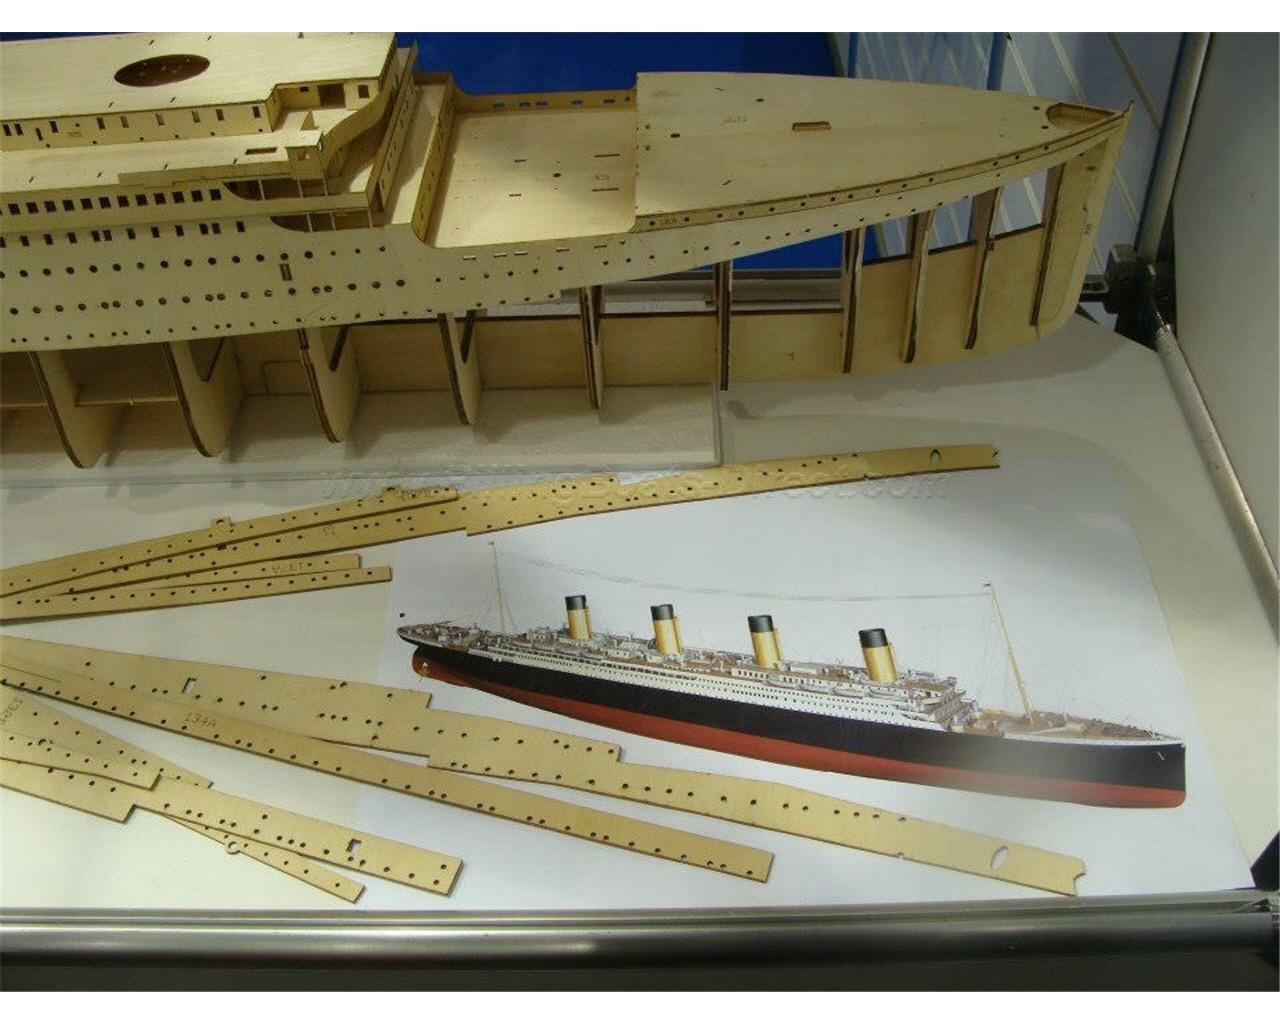 Billing Boats Titanic Model Boat Kit B510